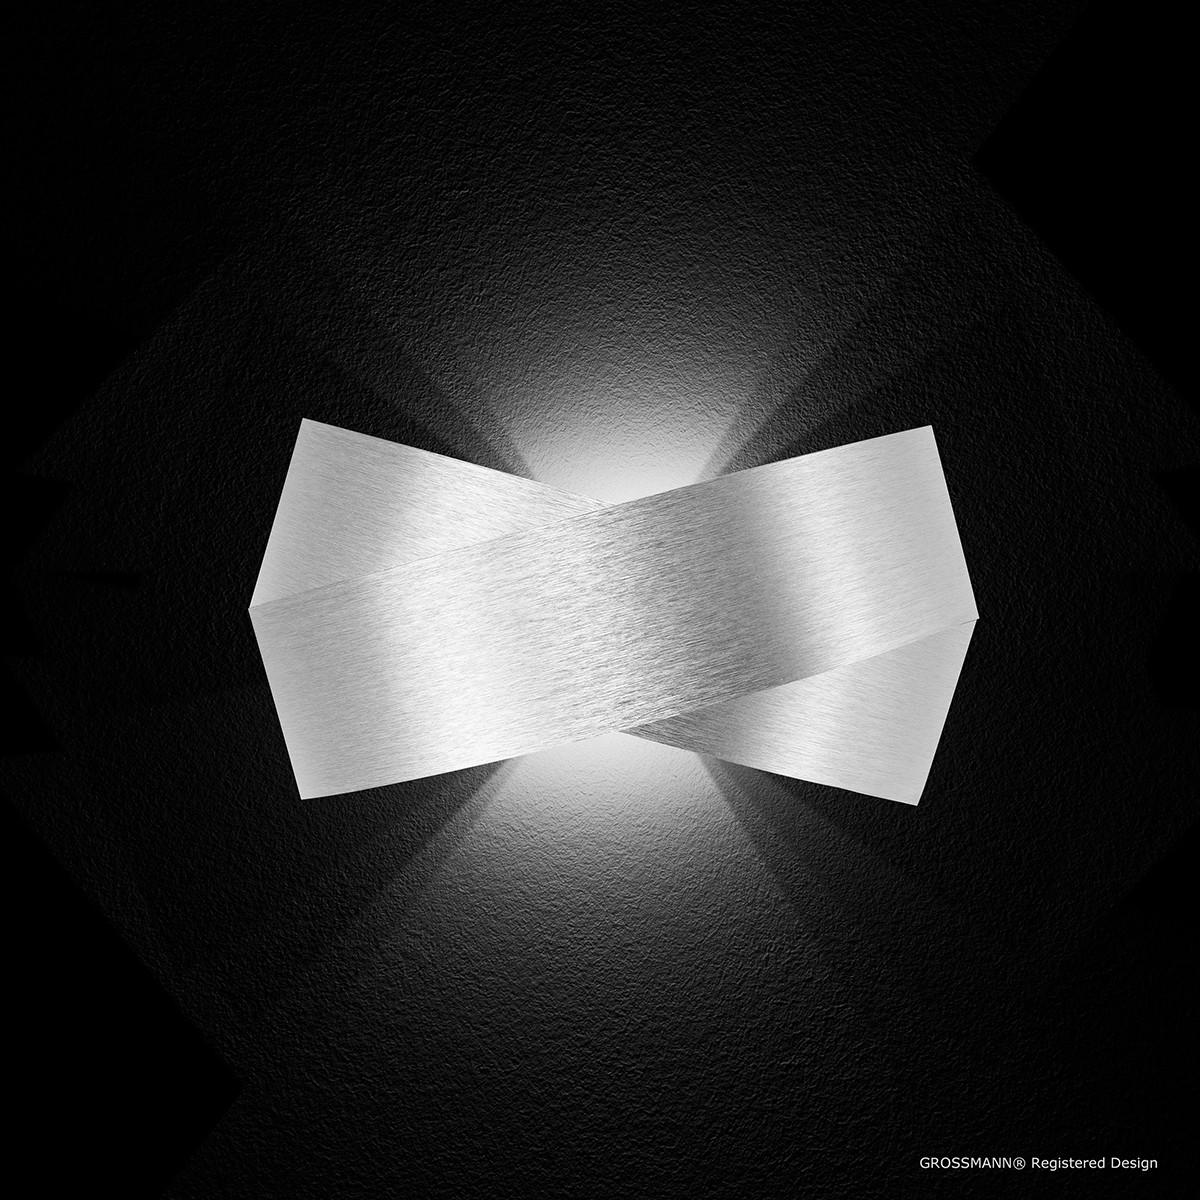 Grossmann Calimero LED Wandleuchte, Aluminium gebürstet